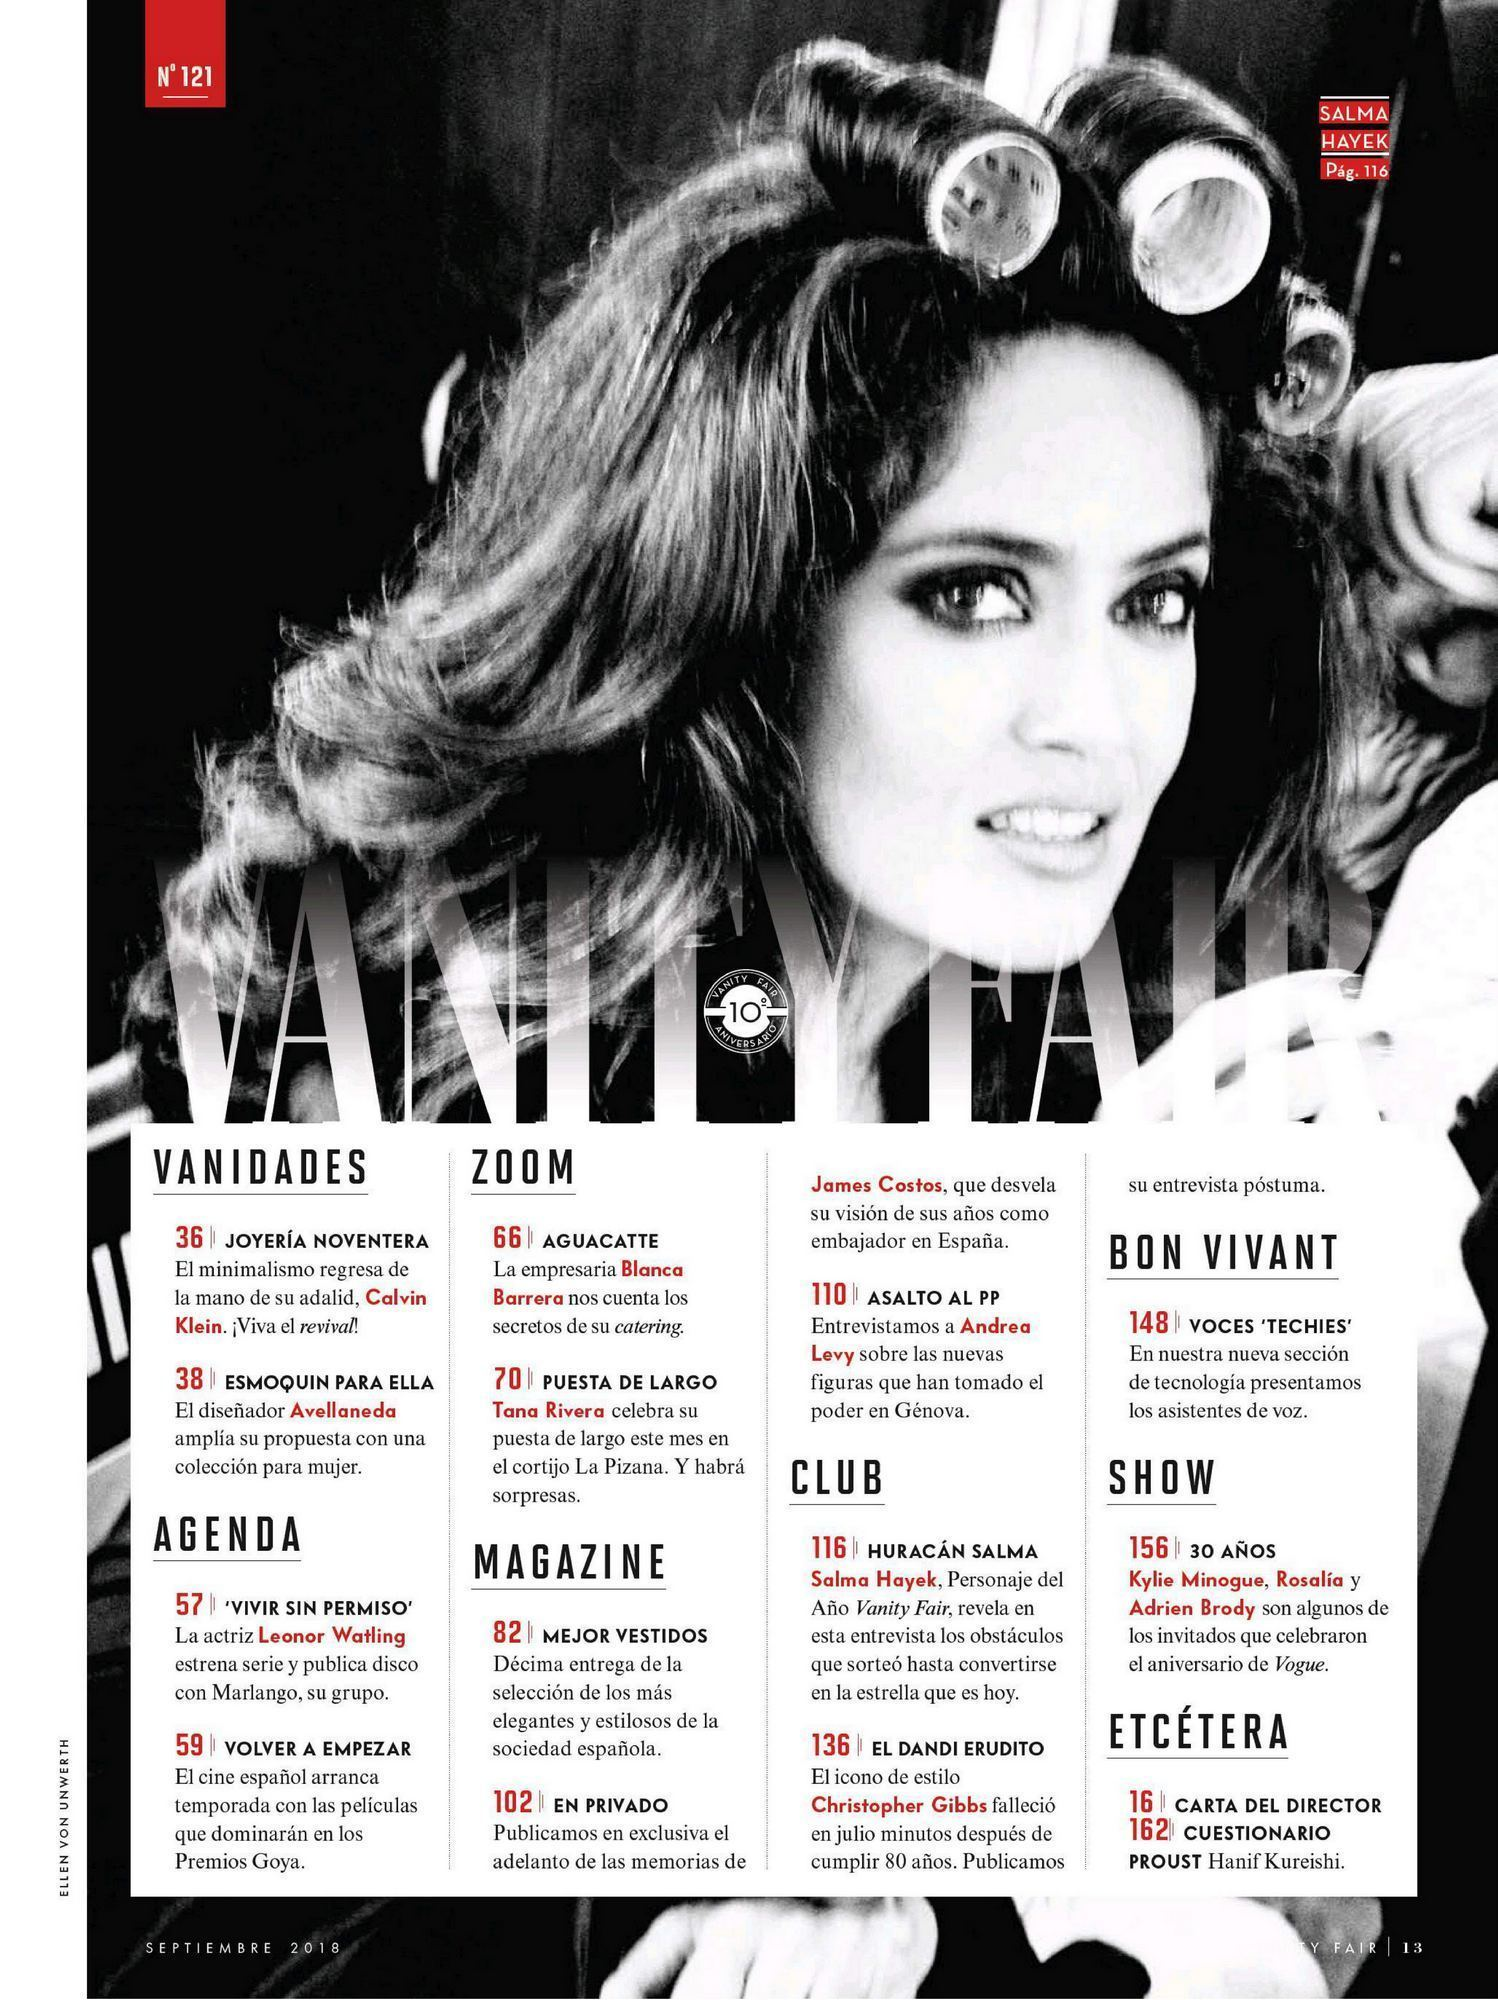 Salma-Hayek-Vanity-Fair-September-2018Salma-Hayek-Vanity-Fair-September-2018b3bfbf953200874.jpg